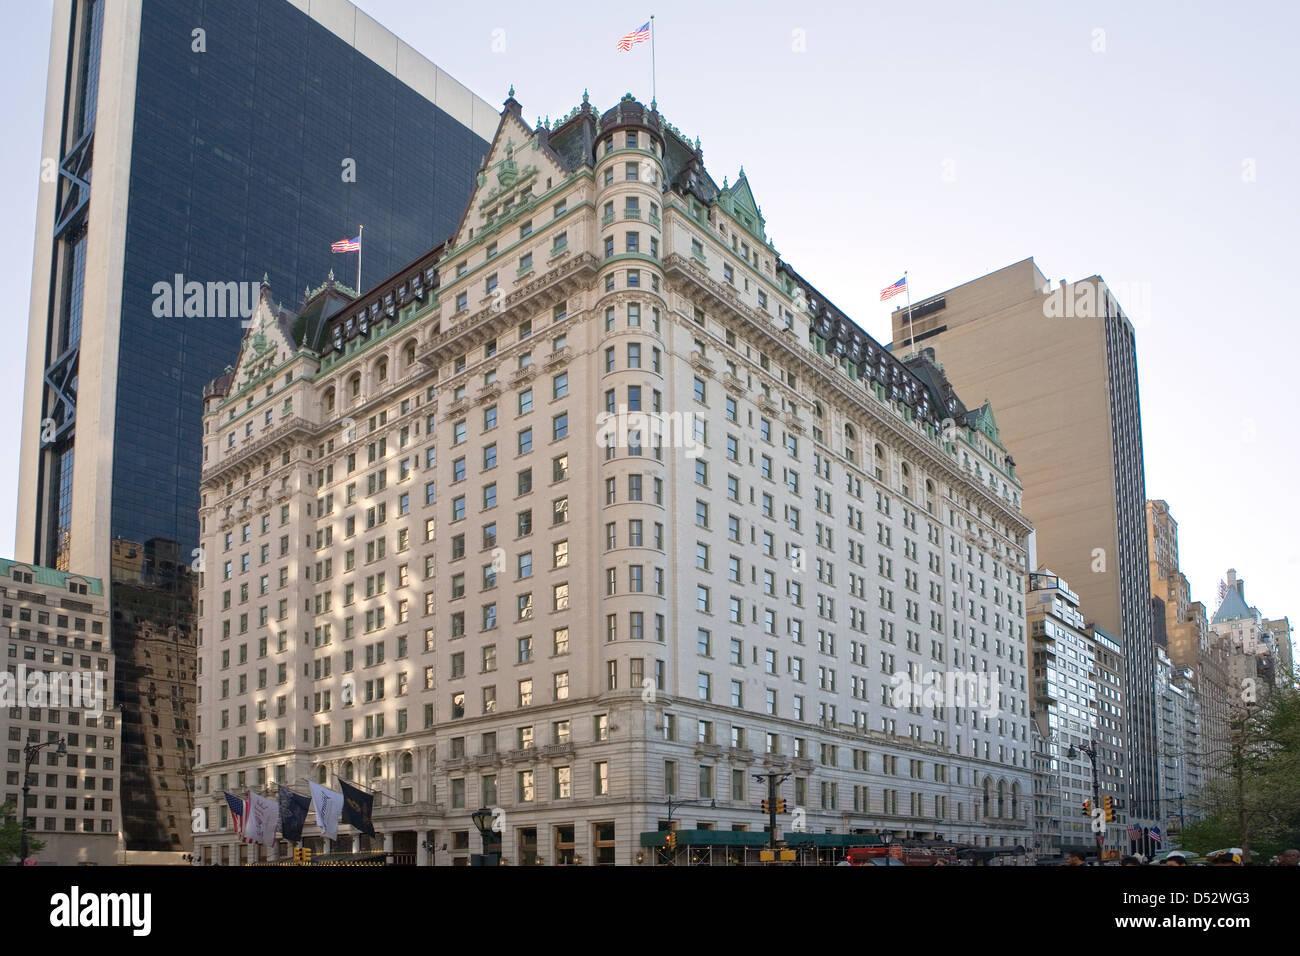 New York City, USA, the luxury hotel The Plaza - Stock Image